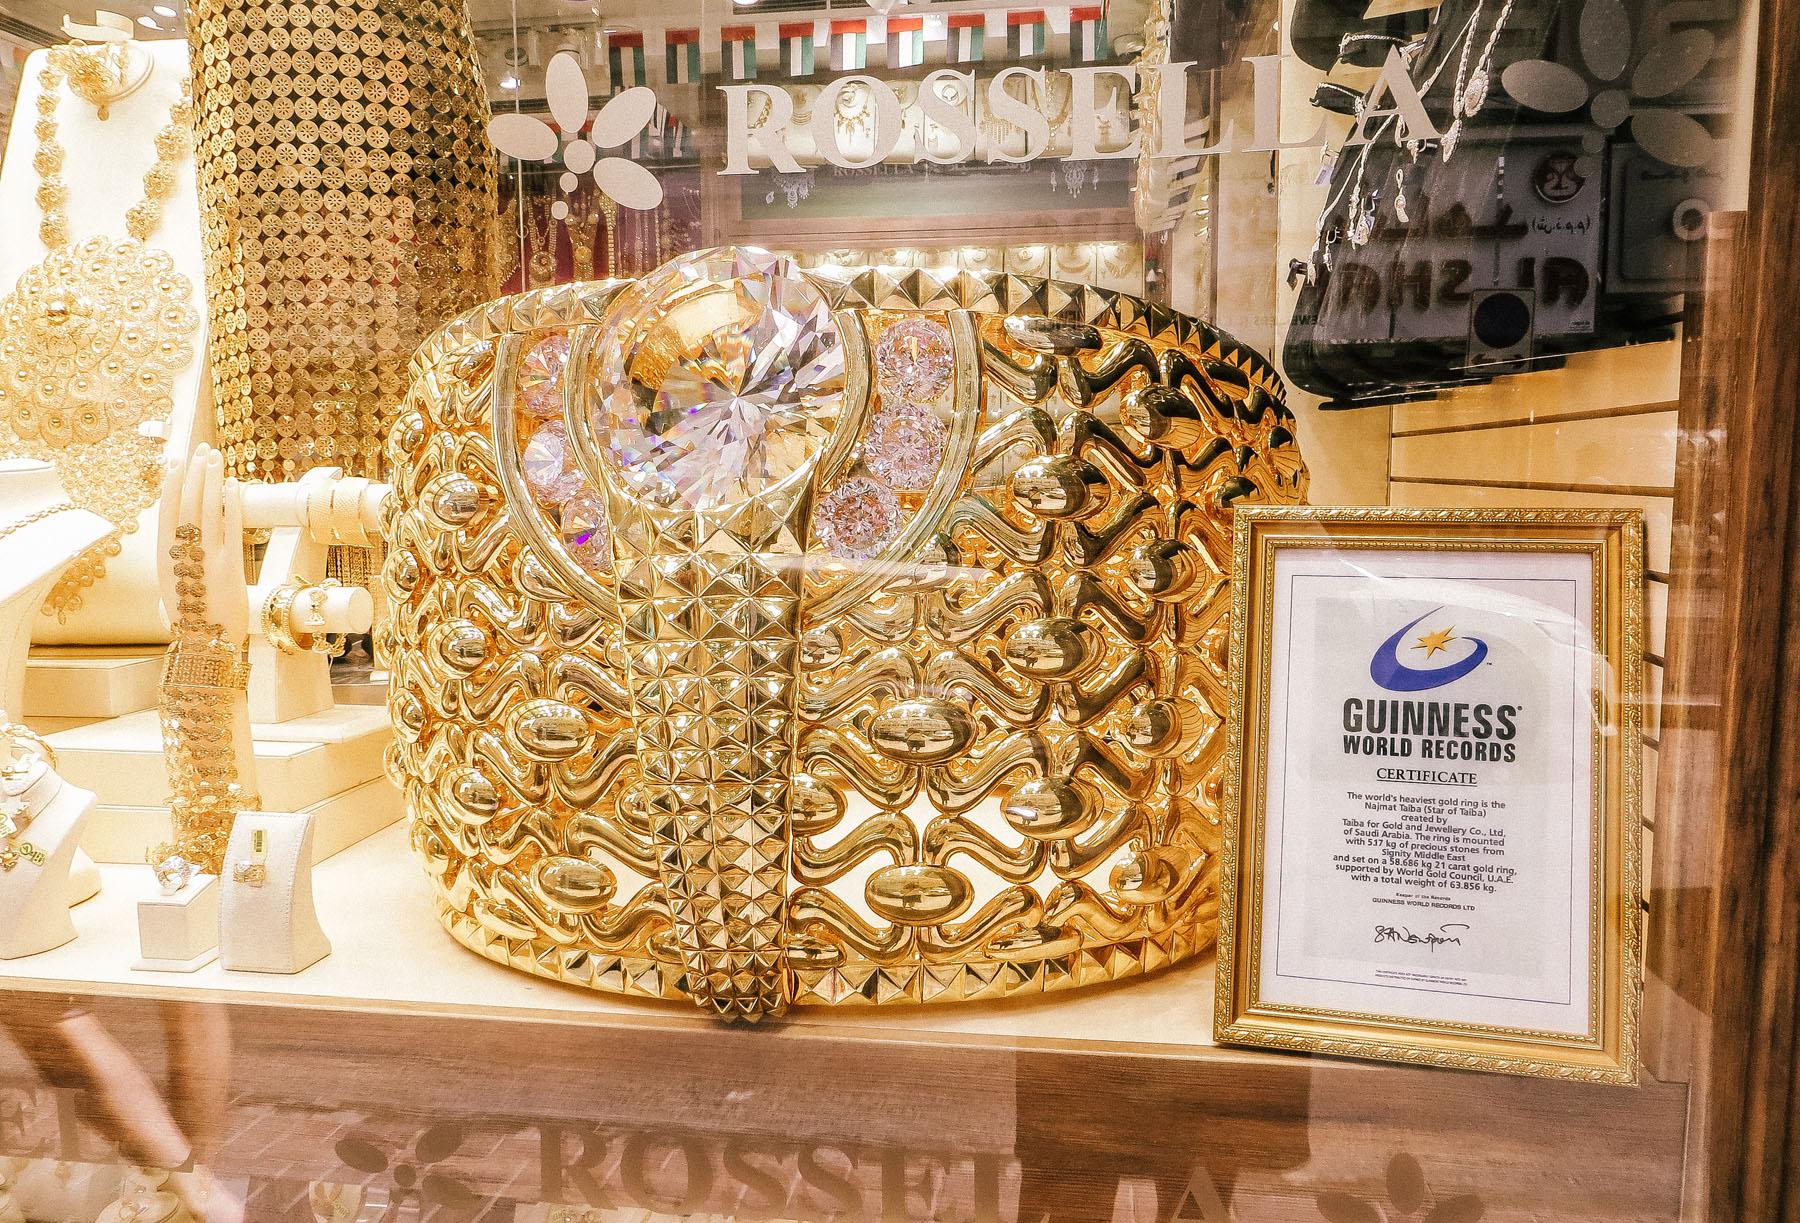 Orient Kreuzfahrt Dubai Gold Souk Ring